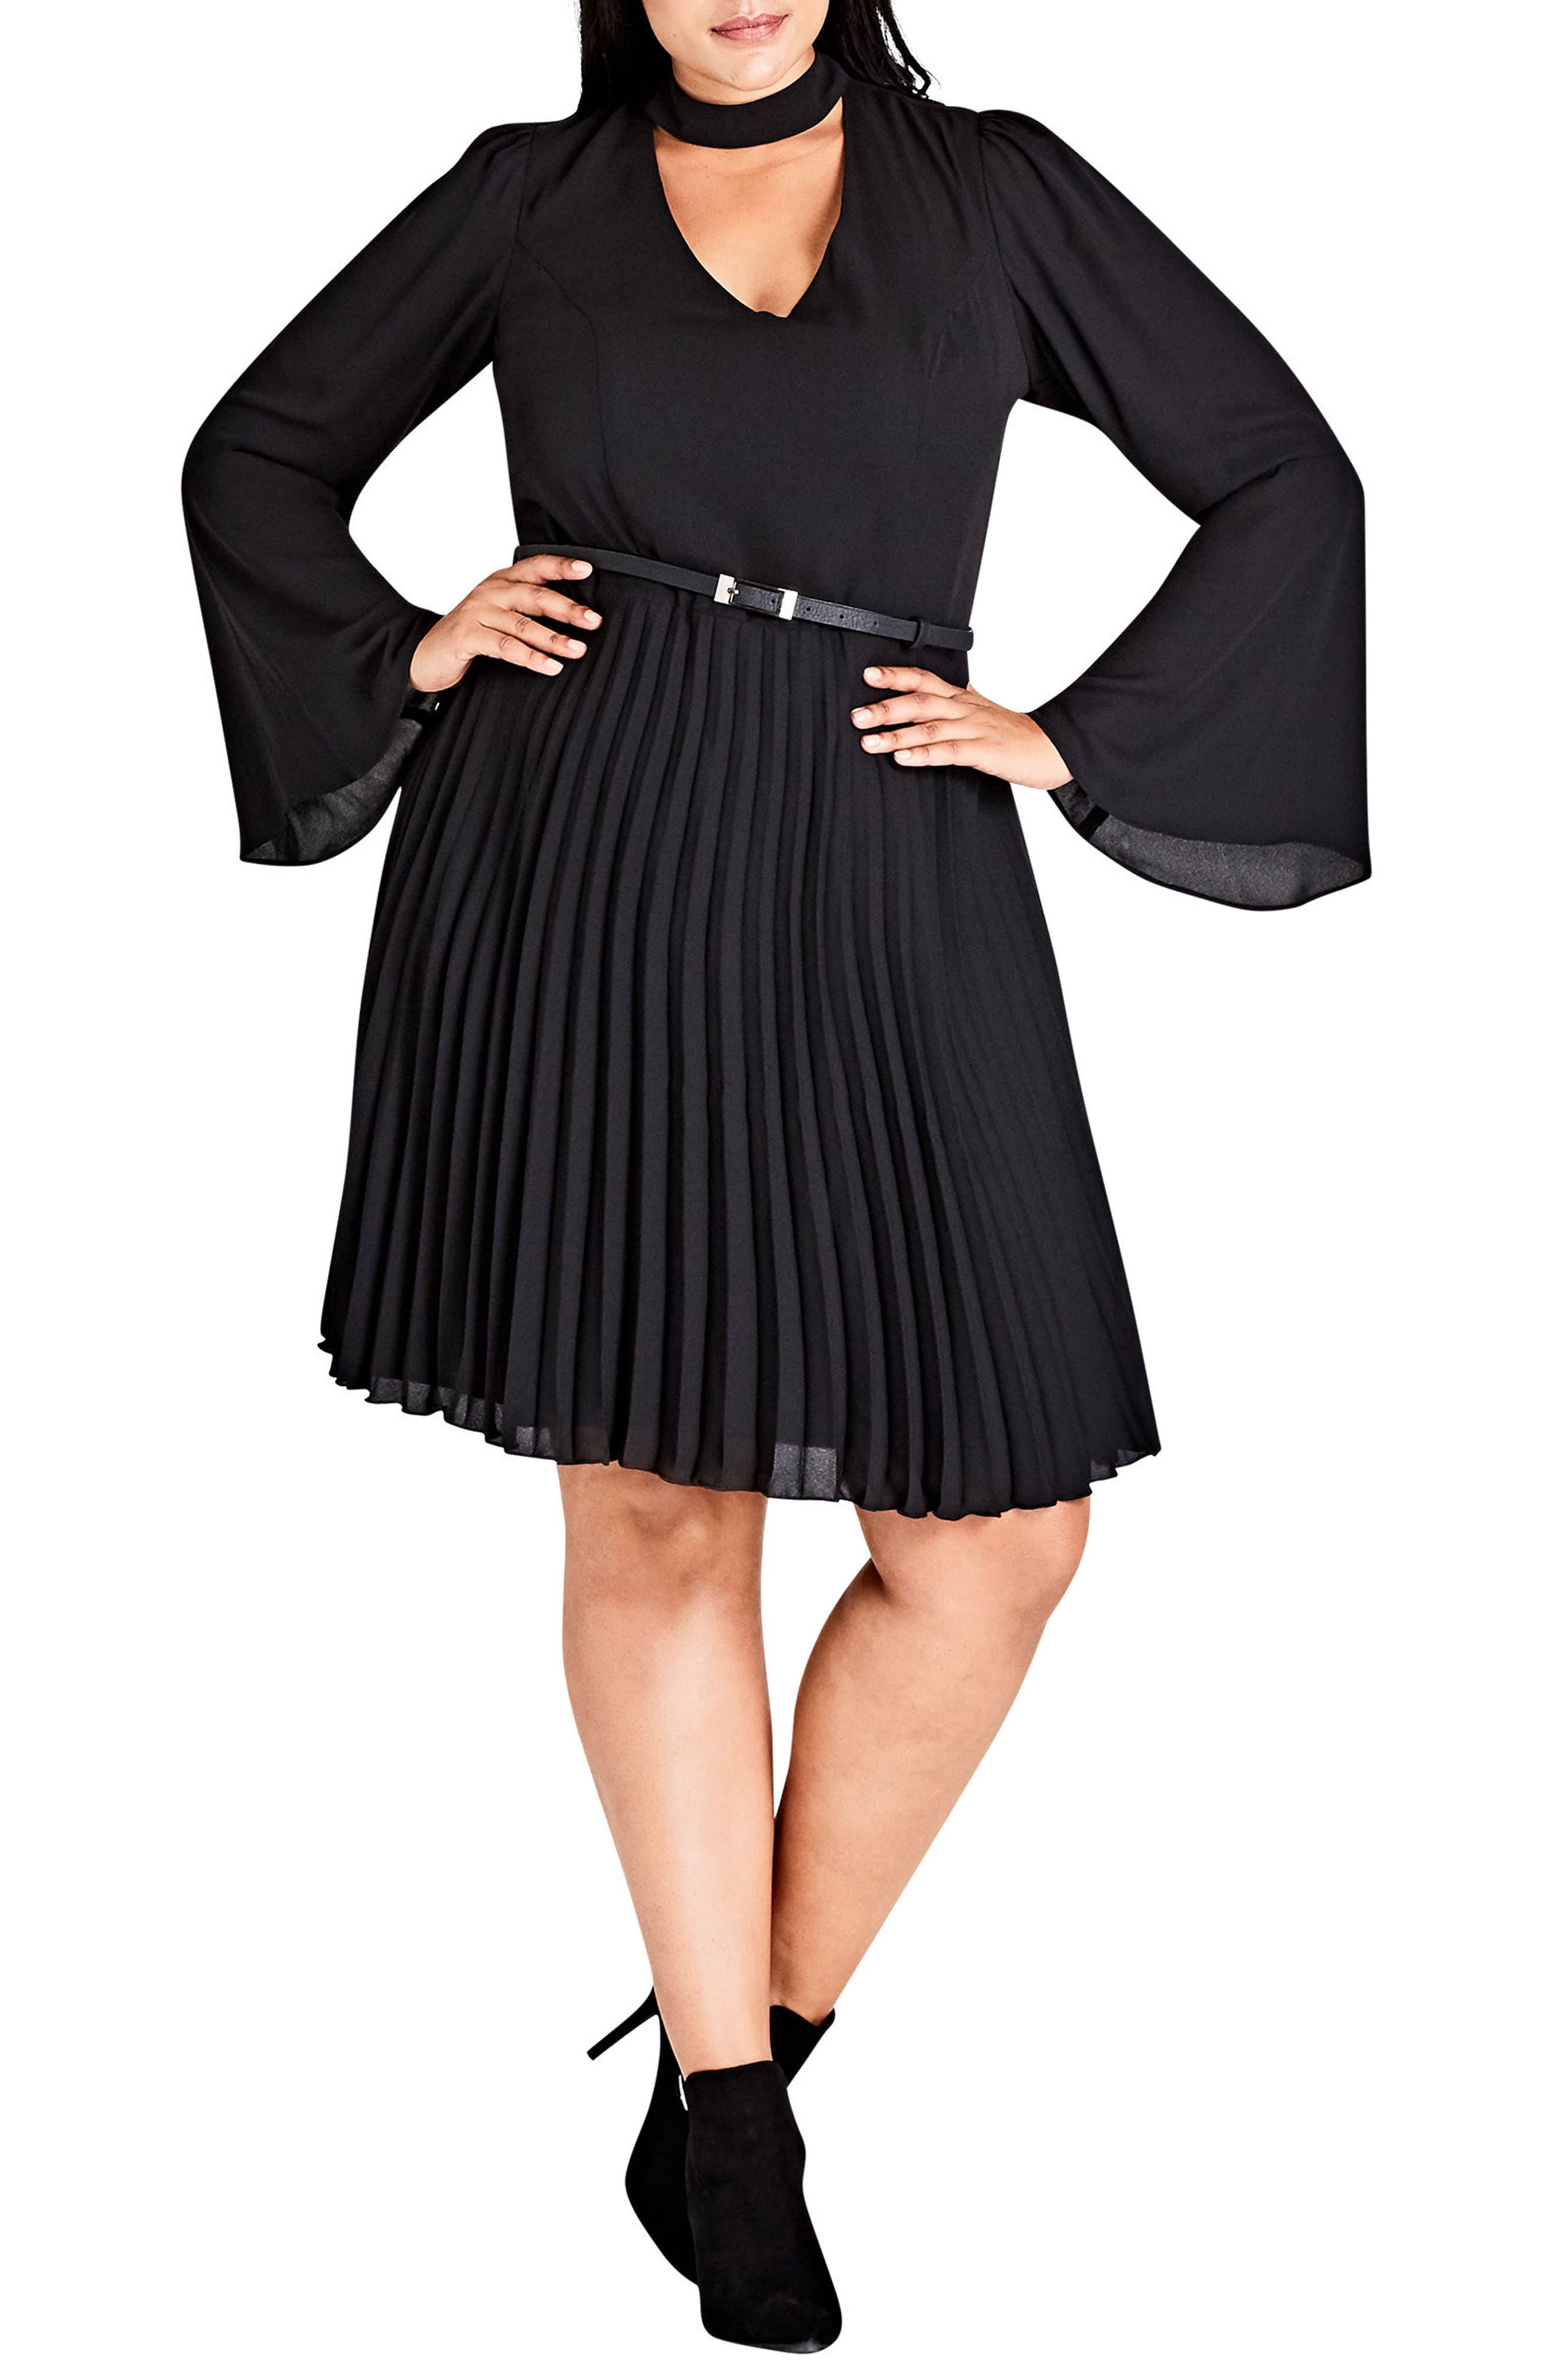 Alternate Image 1 Selected - City Chic Praise Me Bell Sleeve Choker Neck Dress (Plus Size)